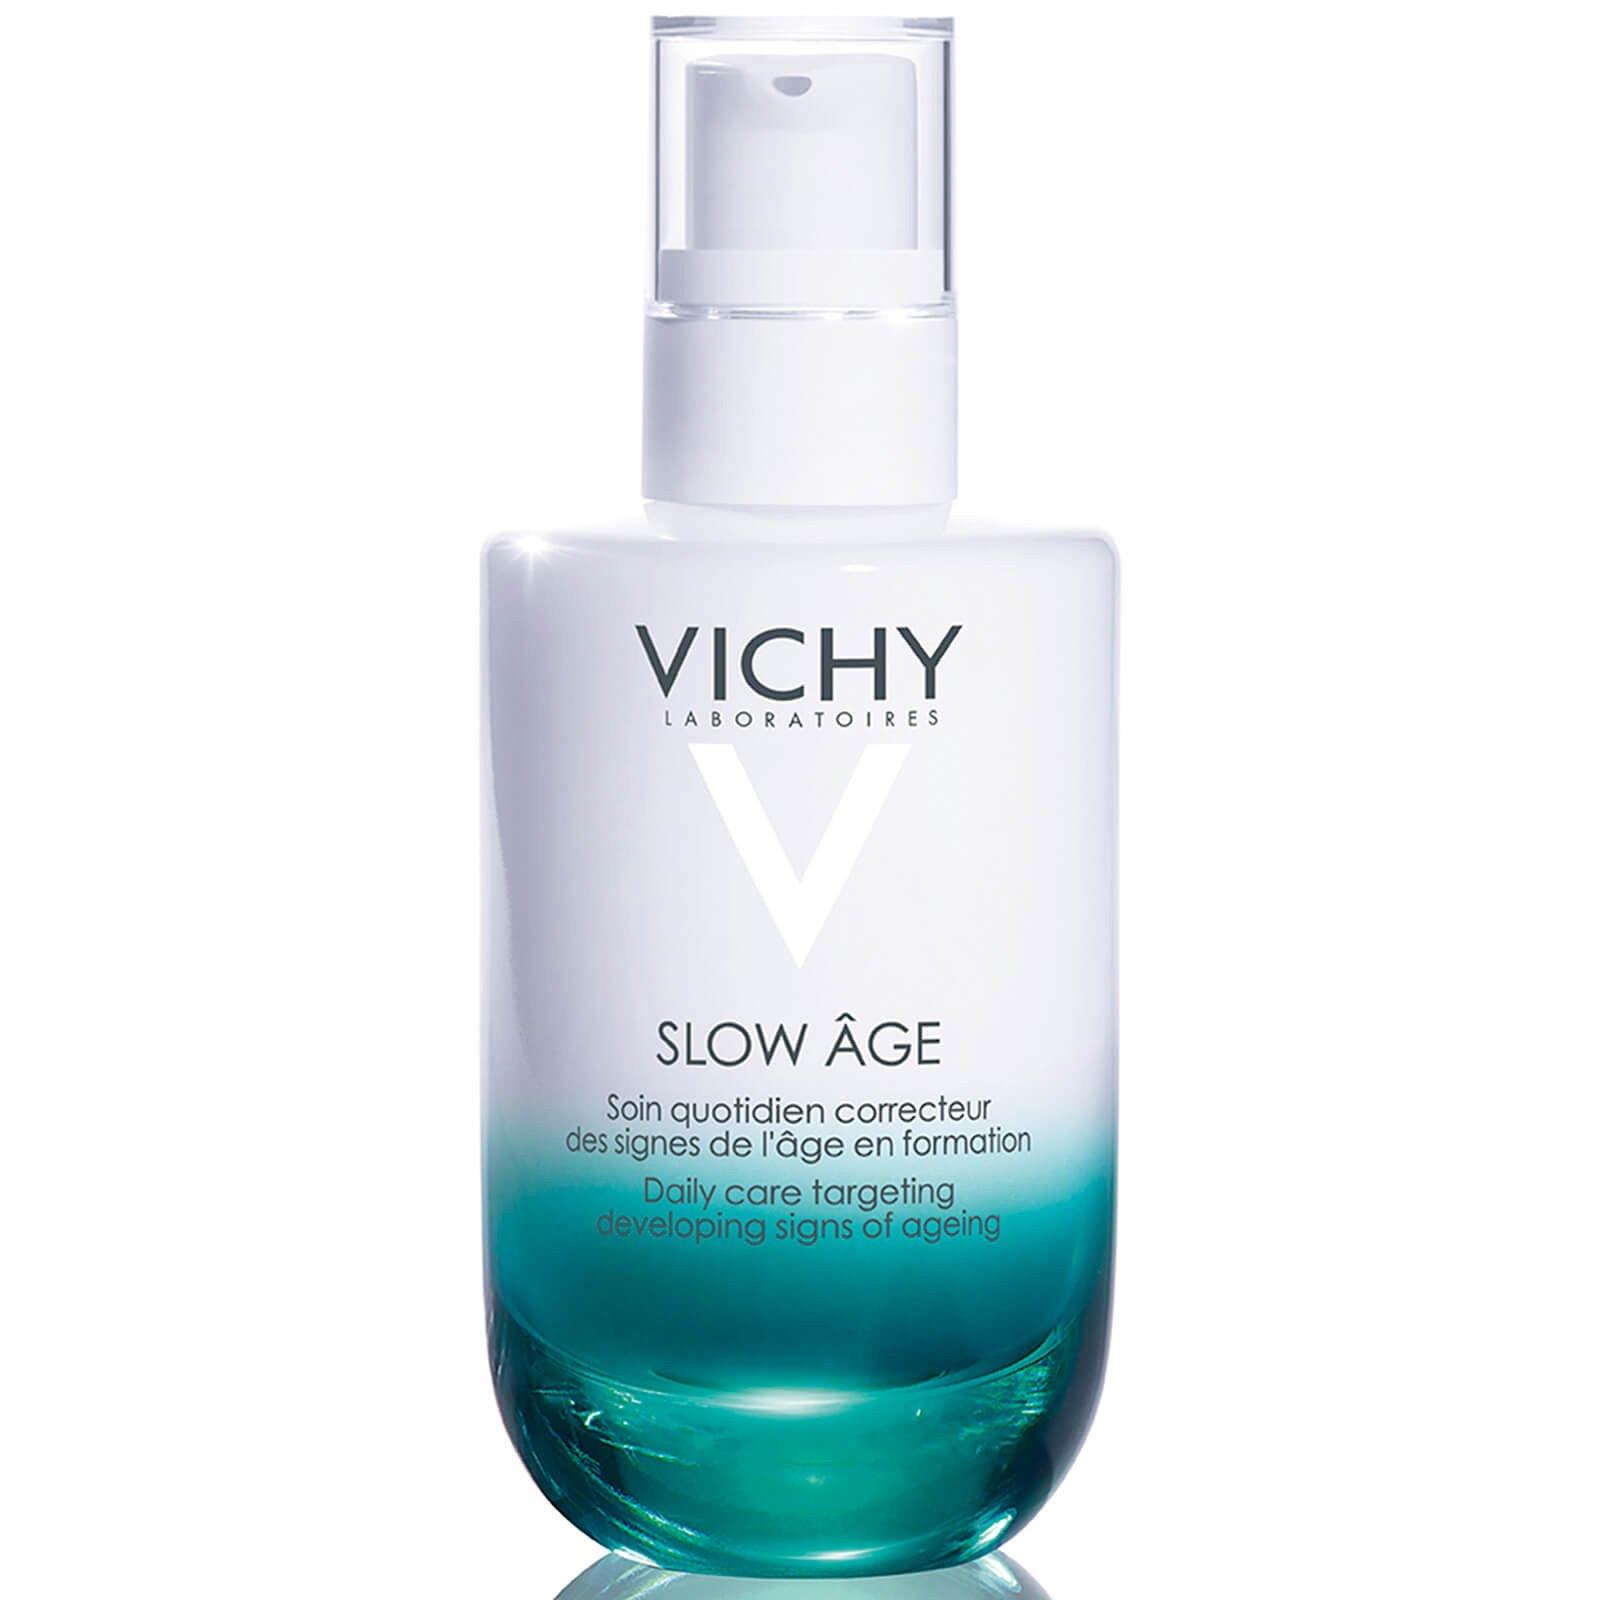 Vichy Slow Age Spf25 Κρέμα Ημέρας που Επιβραδύνει τη Γήρανση της Επιδερμίδας 50ml